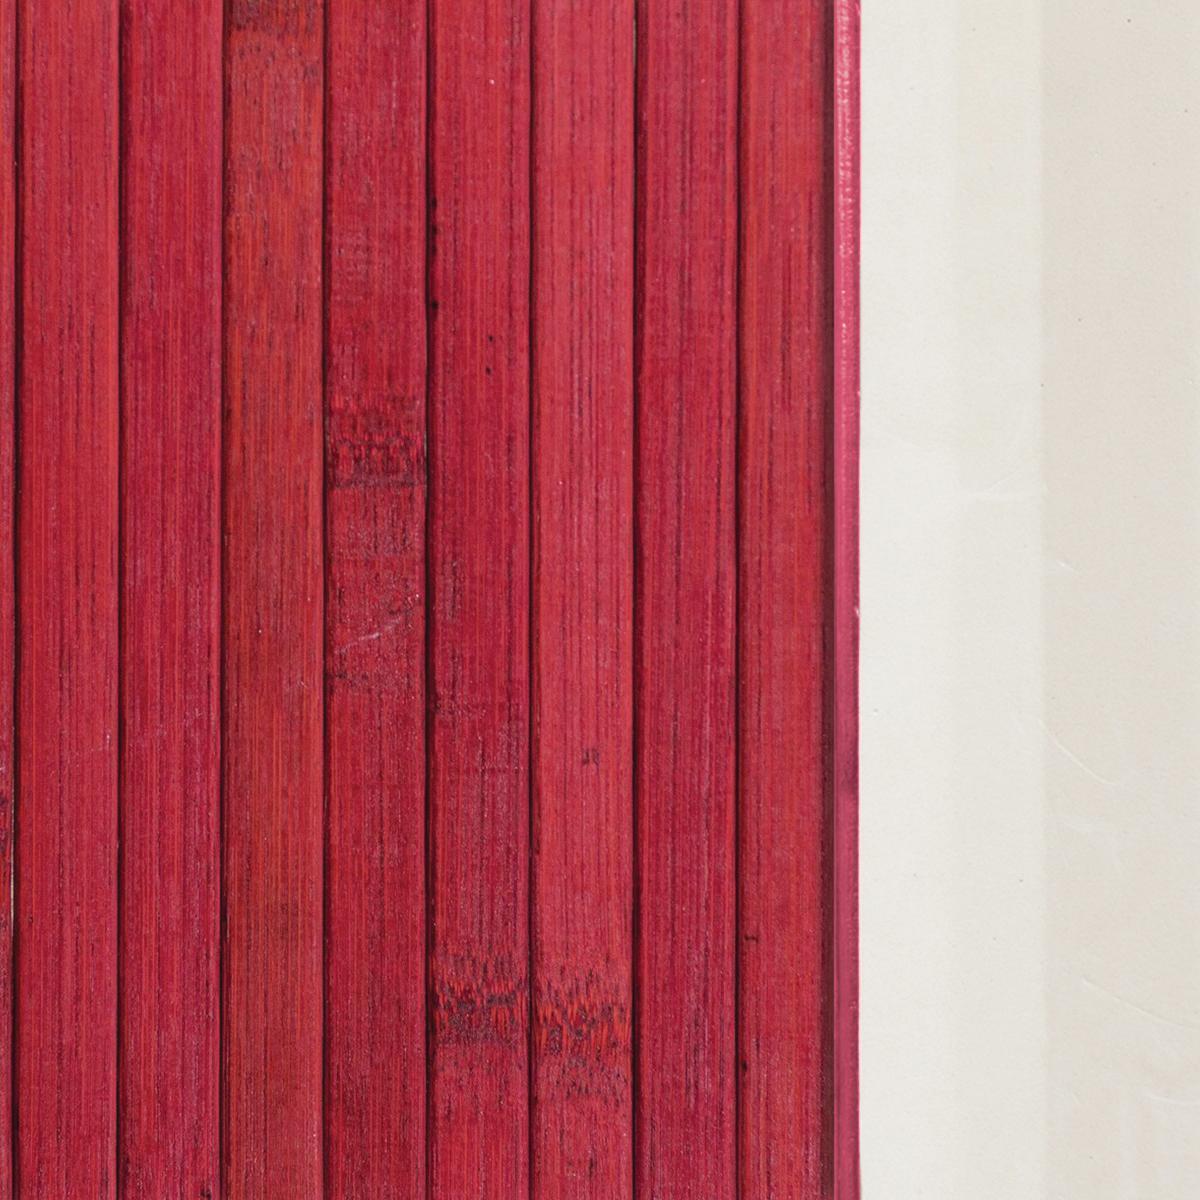 Passatoia Bamboo open , rosso, 50x280 - 3